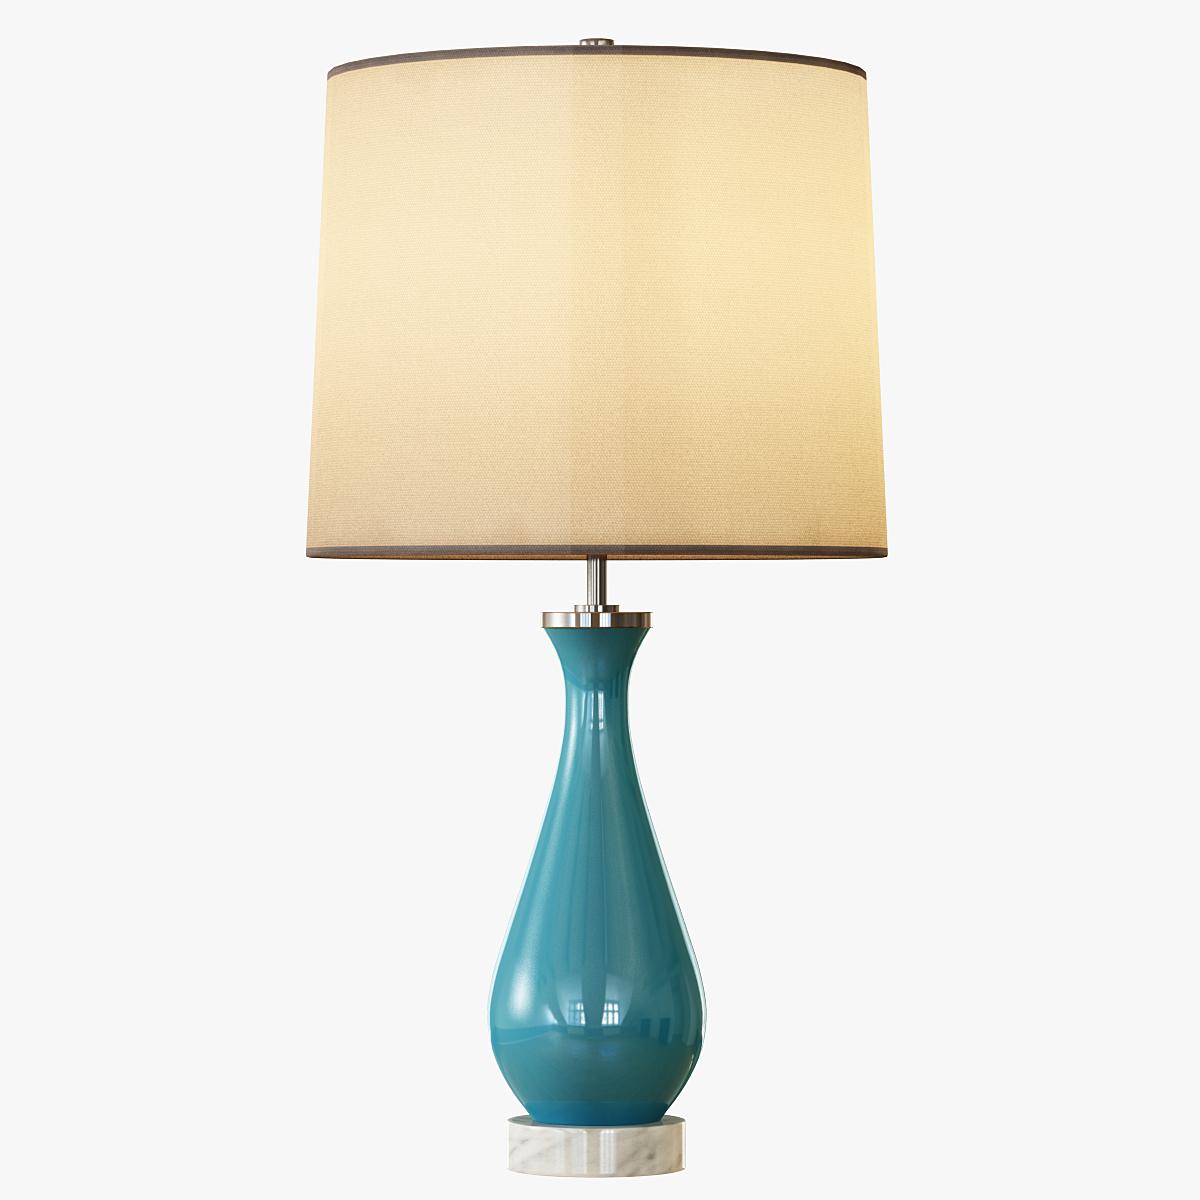 Rejuvenation Colored Glass Table Lamp - Medium